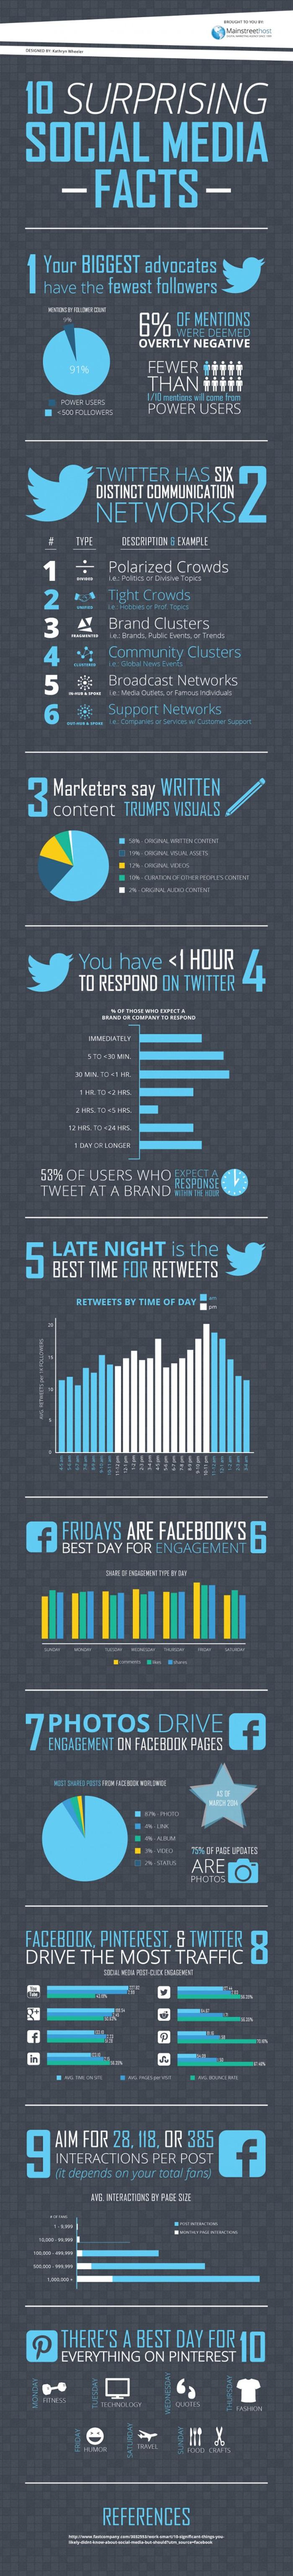 10-surprising-social-media-facts_53c6b9c3304b2_w1500 (1)